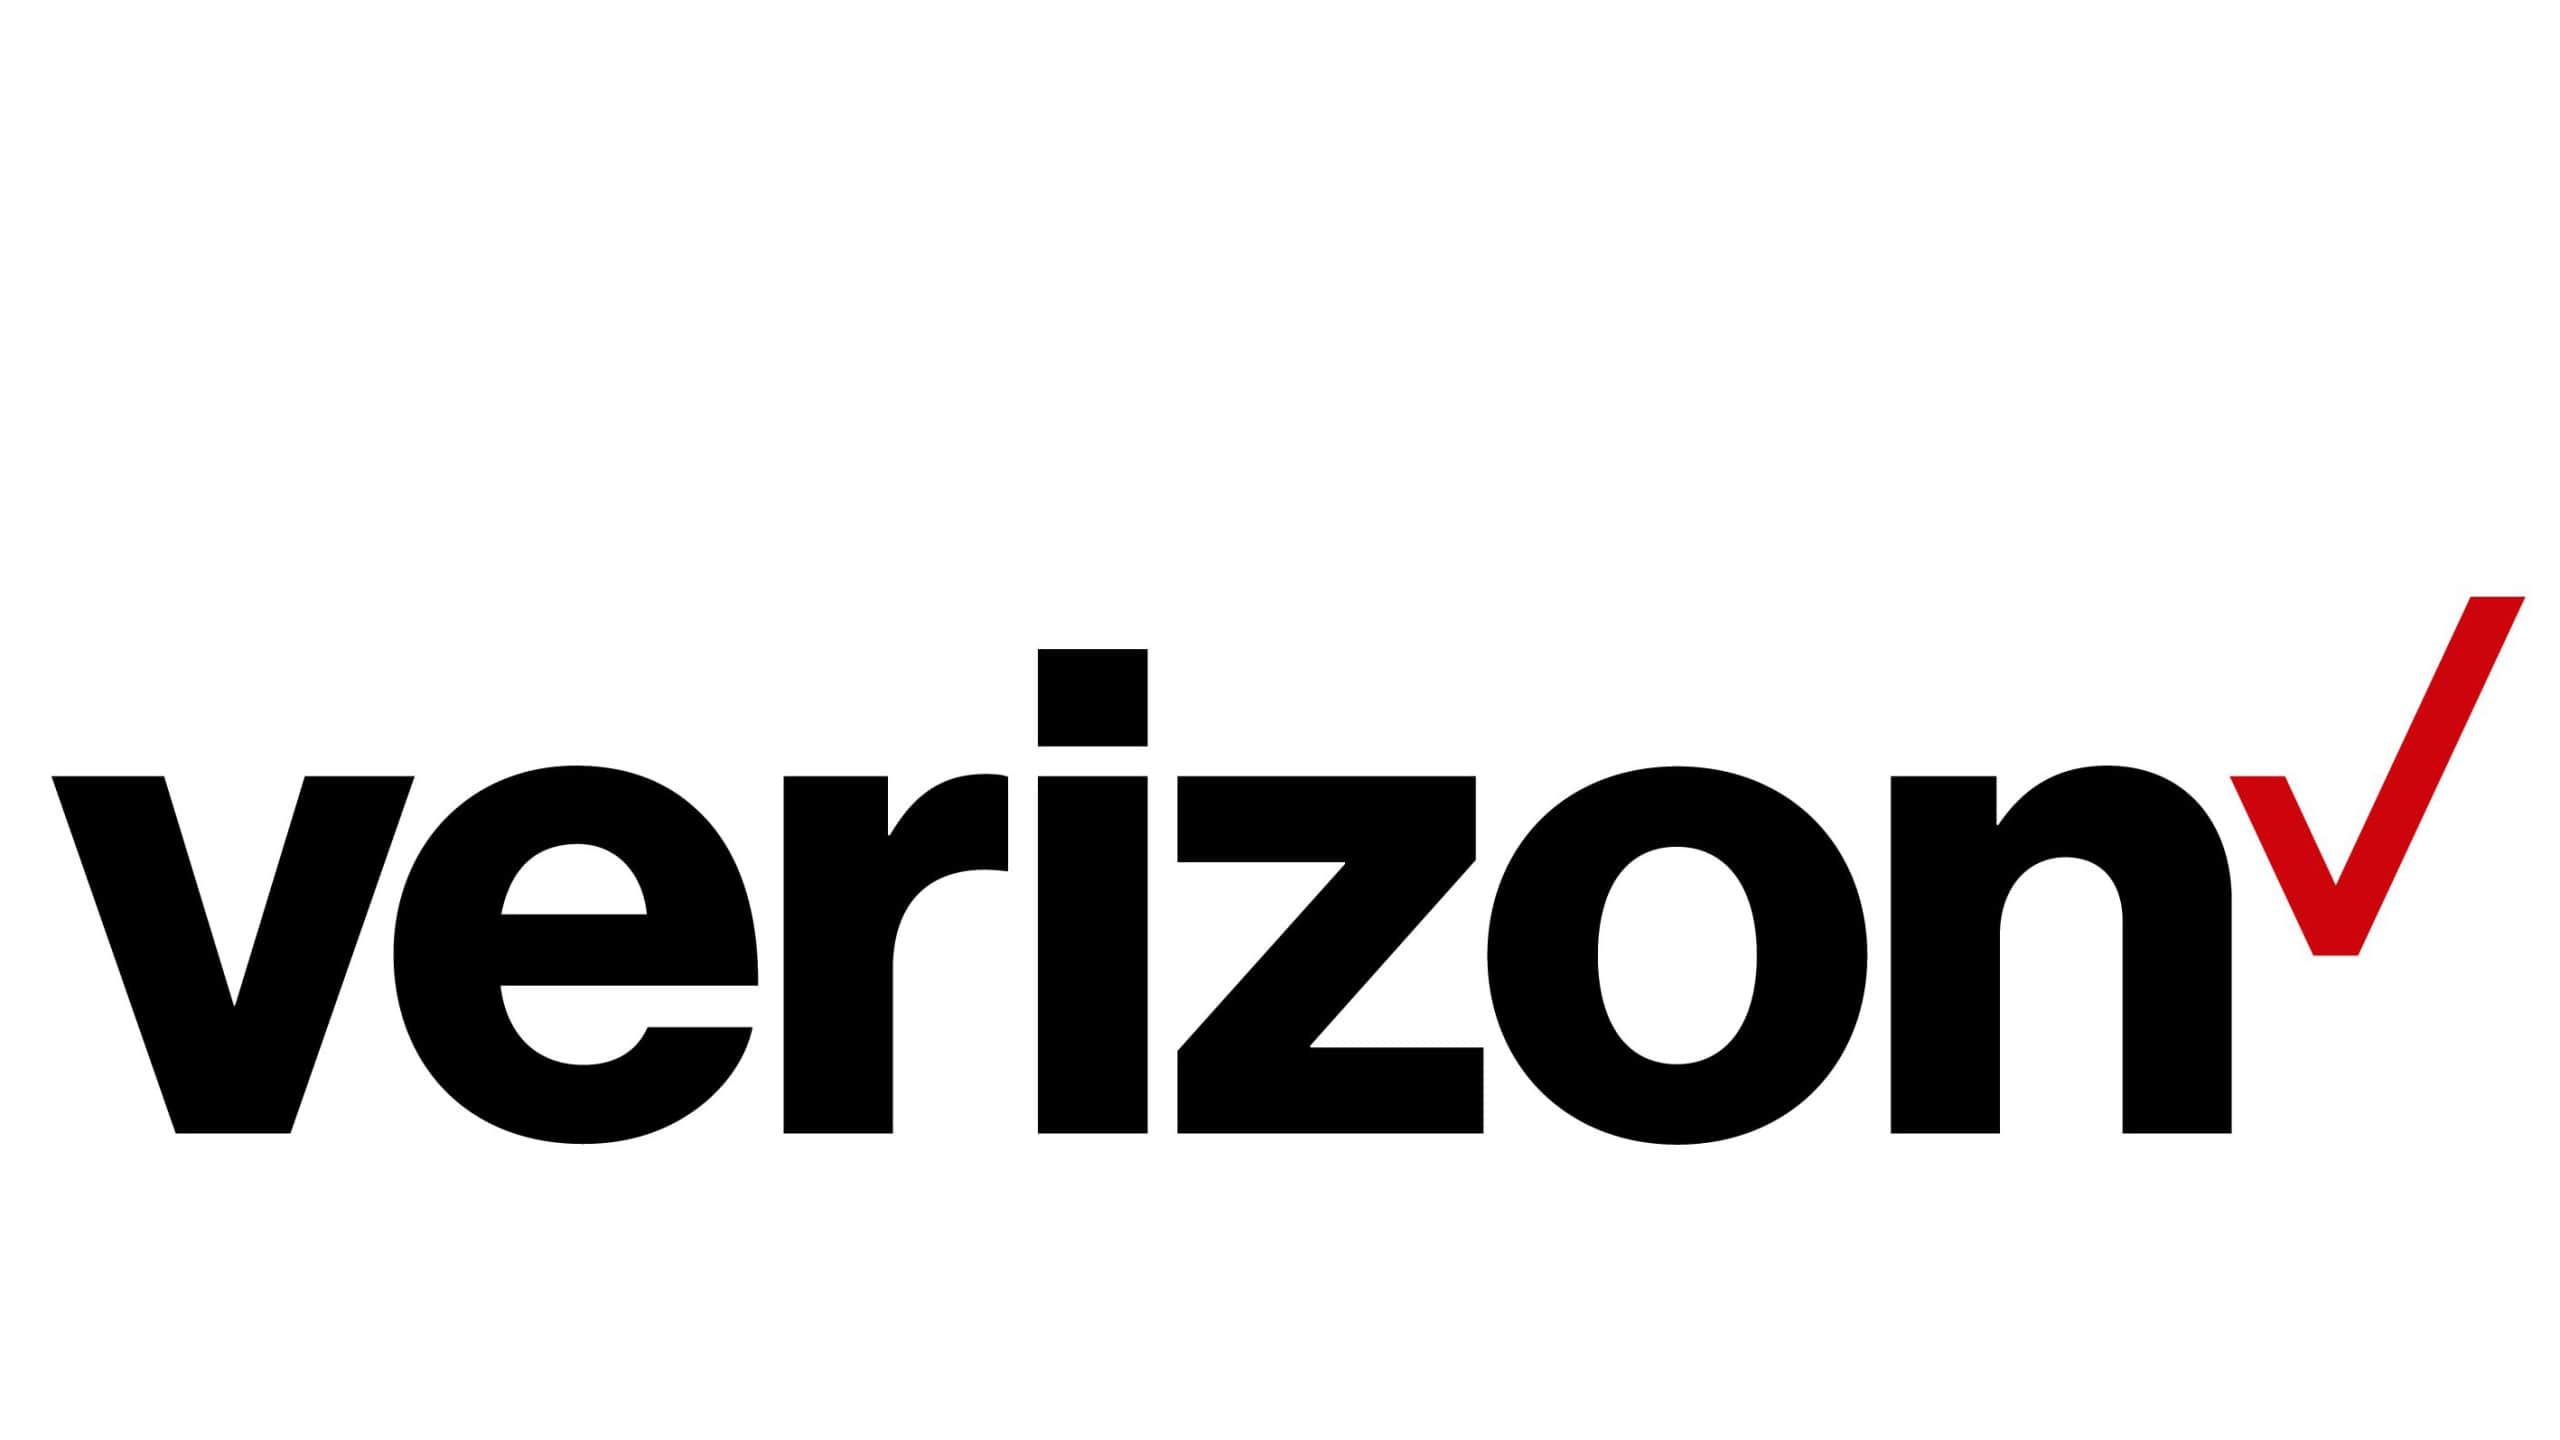 Psyonix's North American RLCS announces Verizon sponsorship